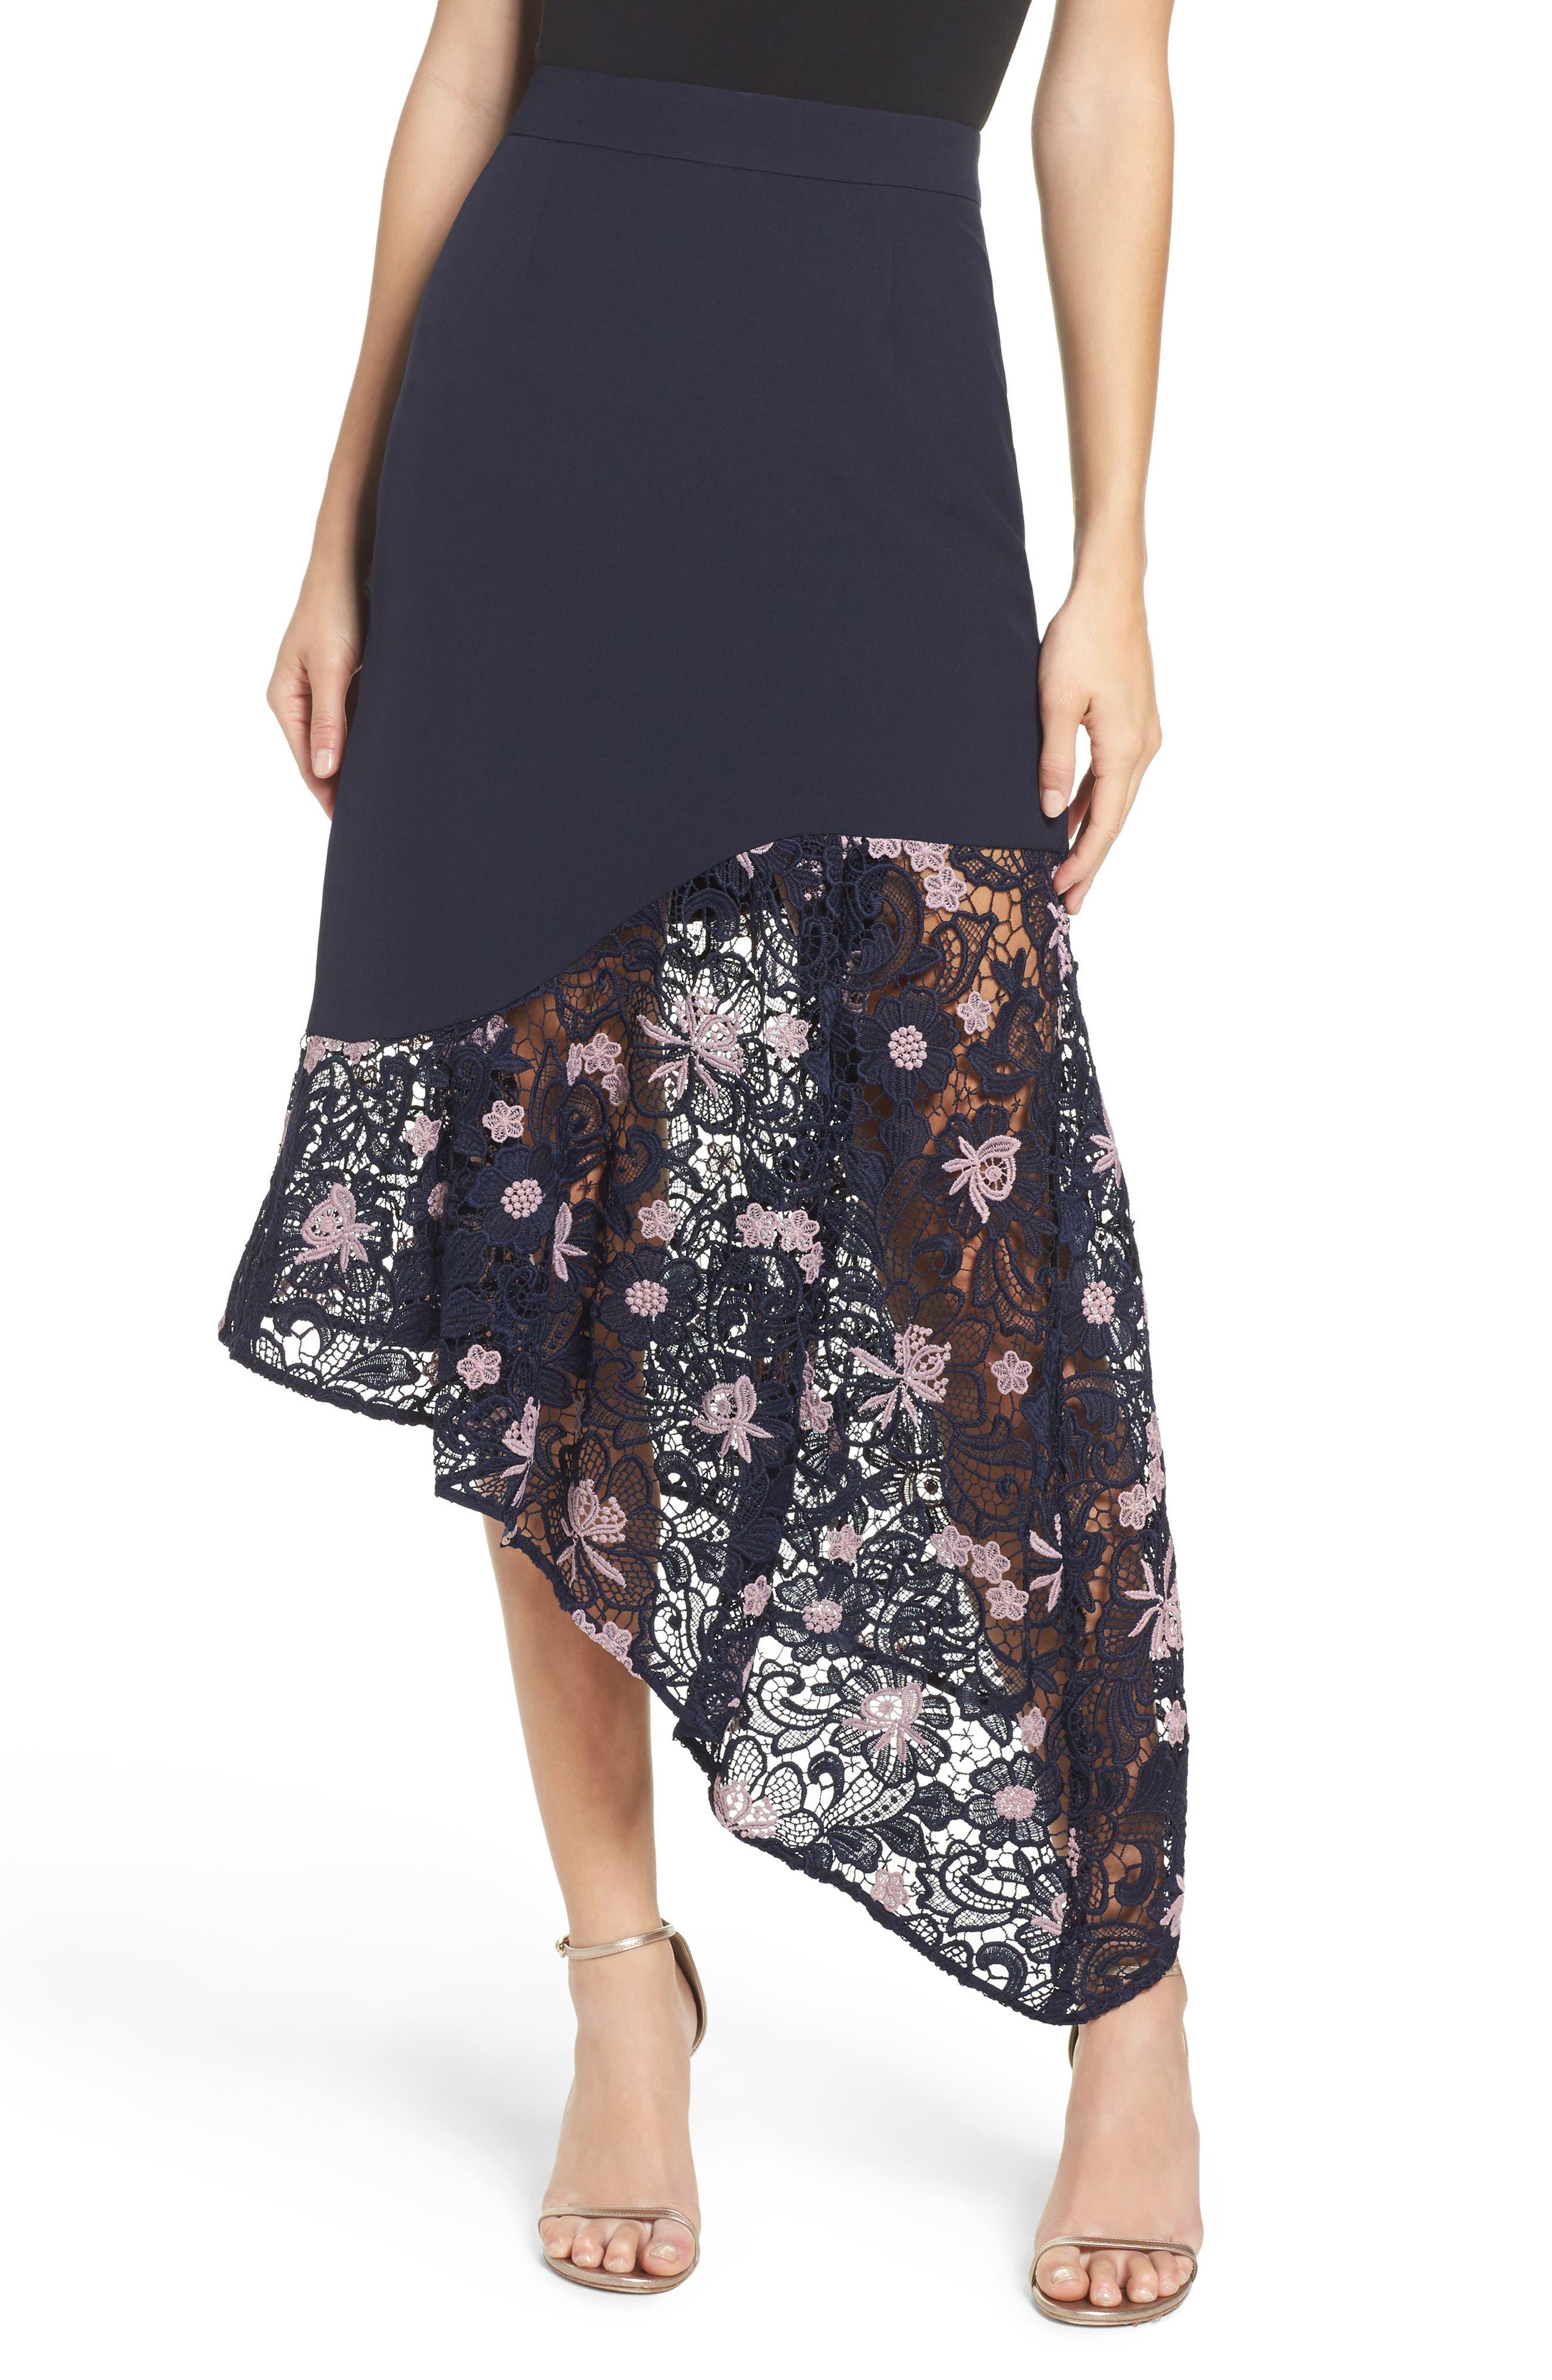 Cooper St Botanic Bloom Lace Asymmetric Skirt